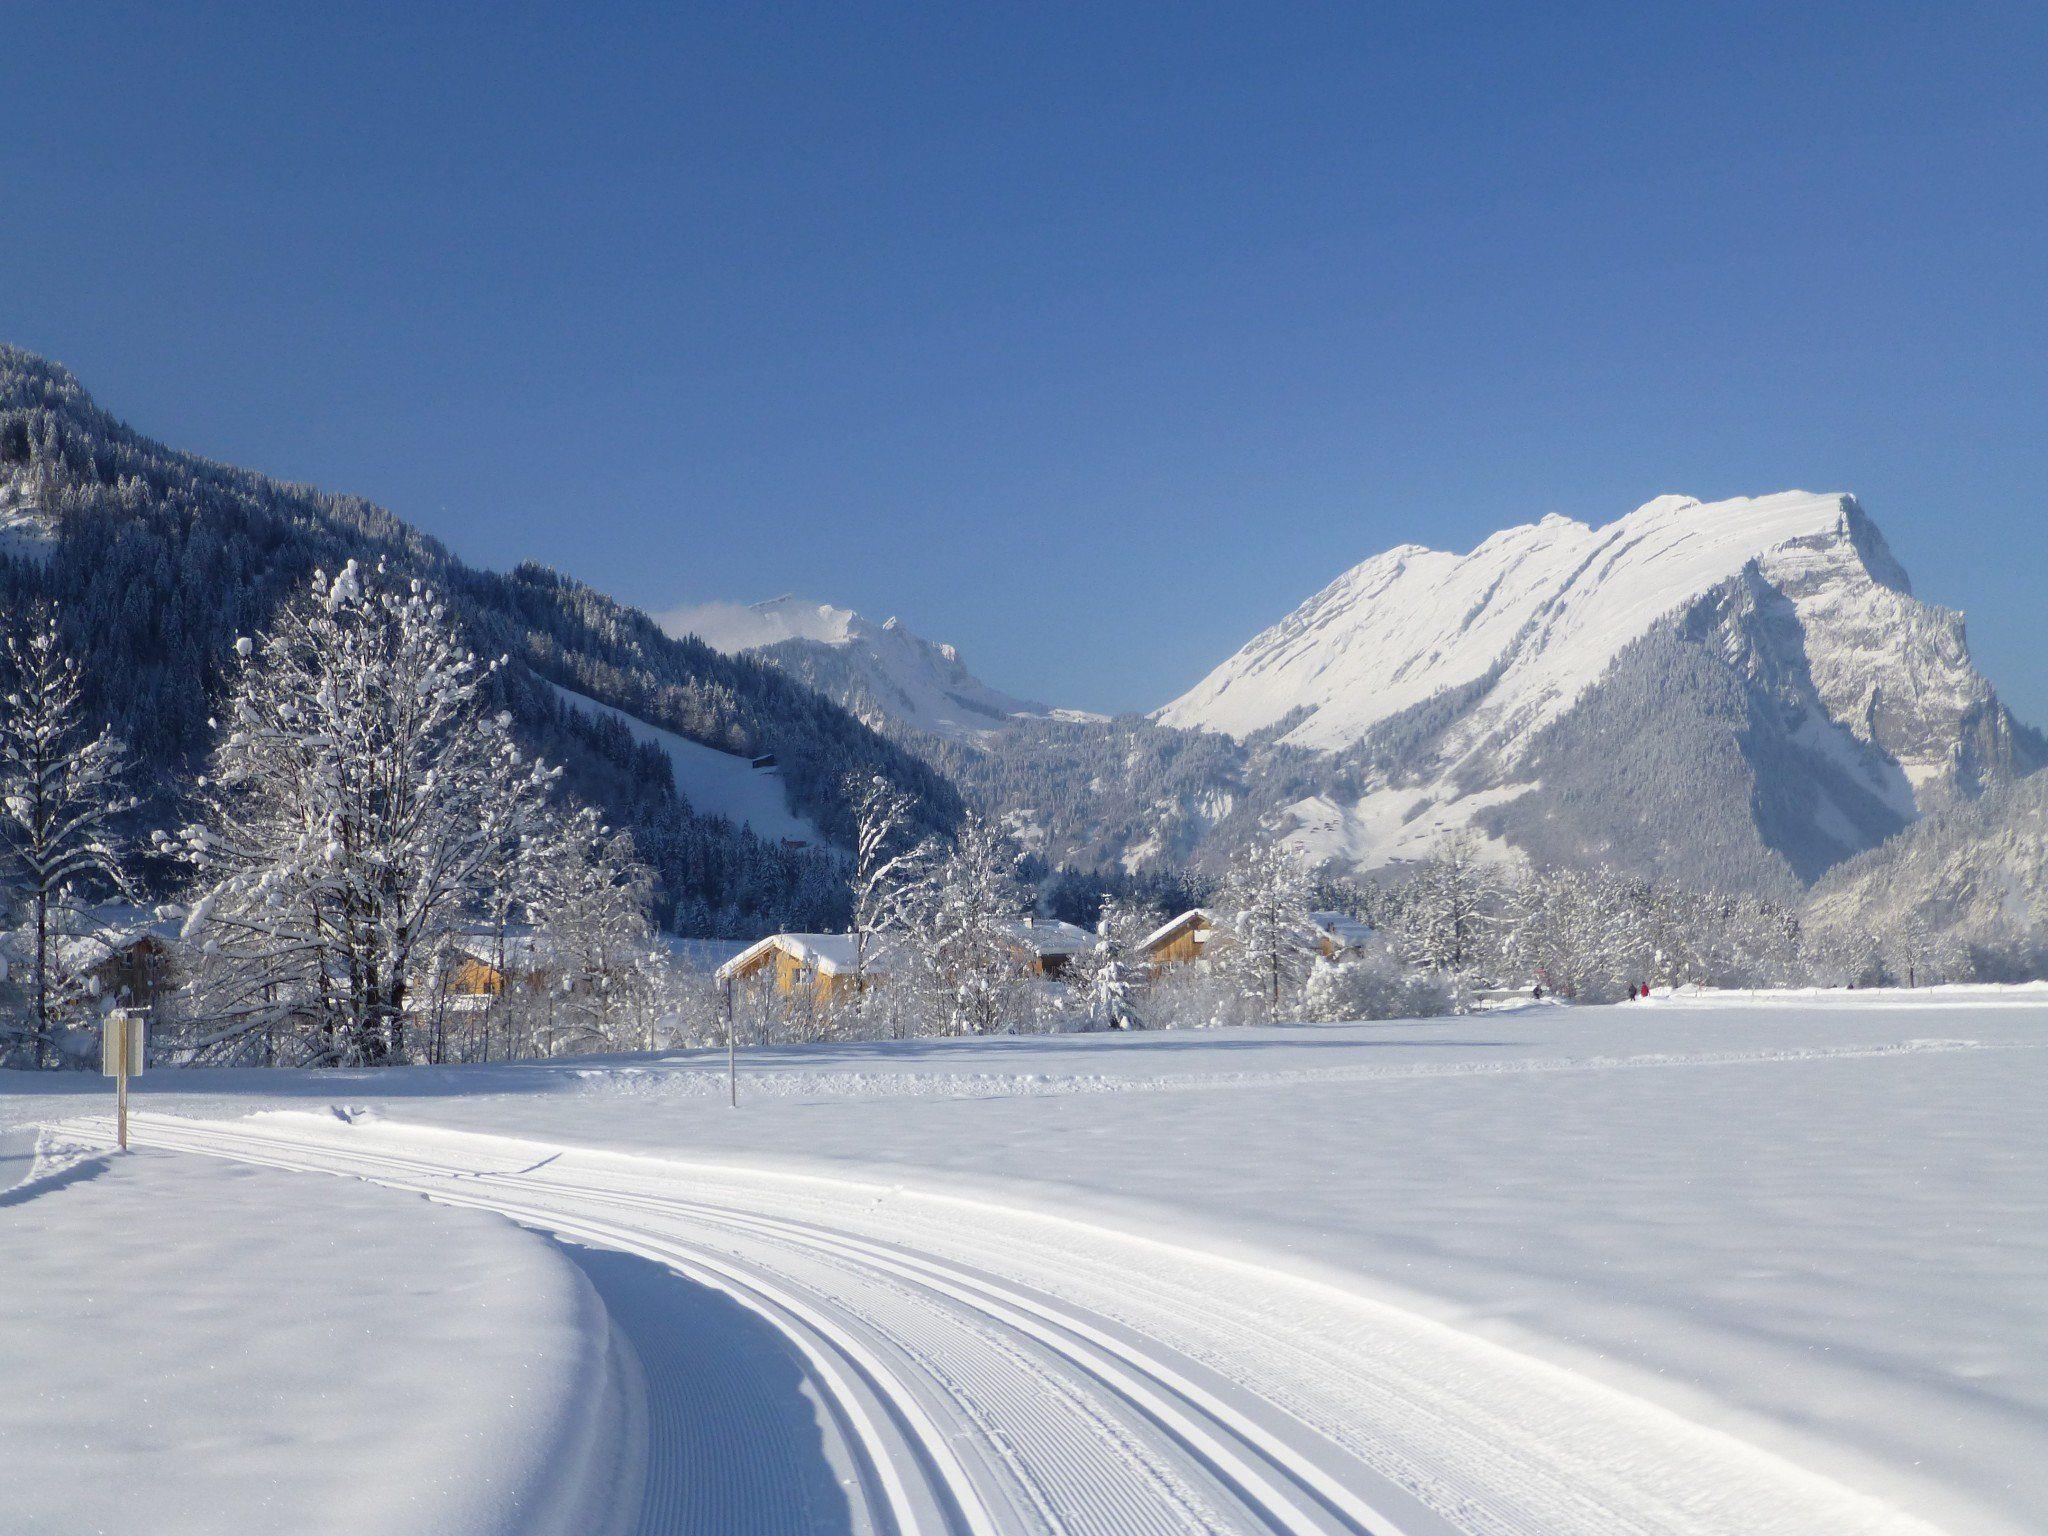 50 Kilometer klassische Langlauf-, 13 Kilometer Skatingloipen und 35 Kilometer Winterwanderwege in Au-Schoppernau.